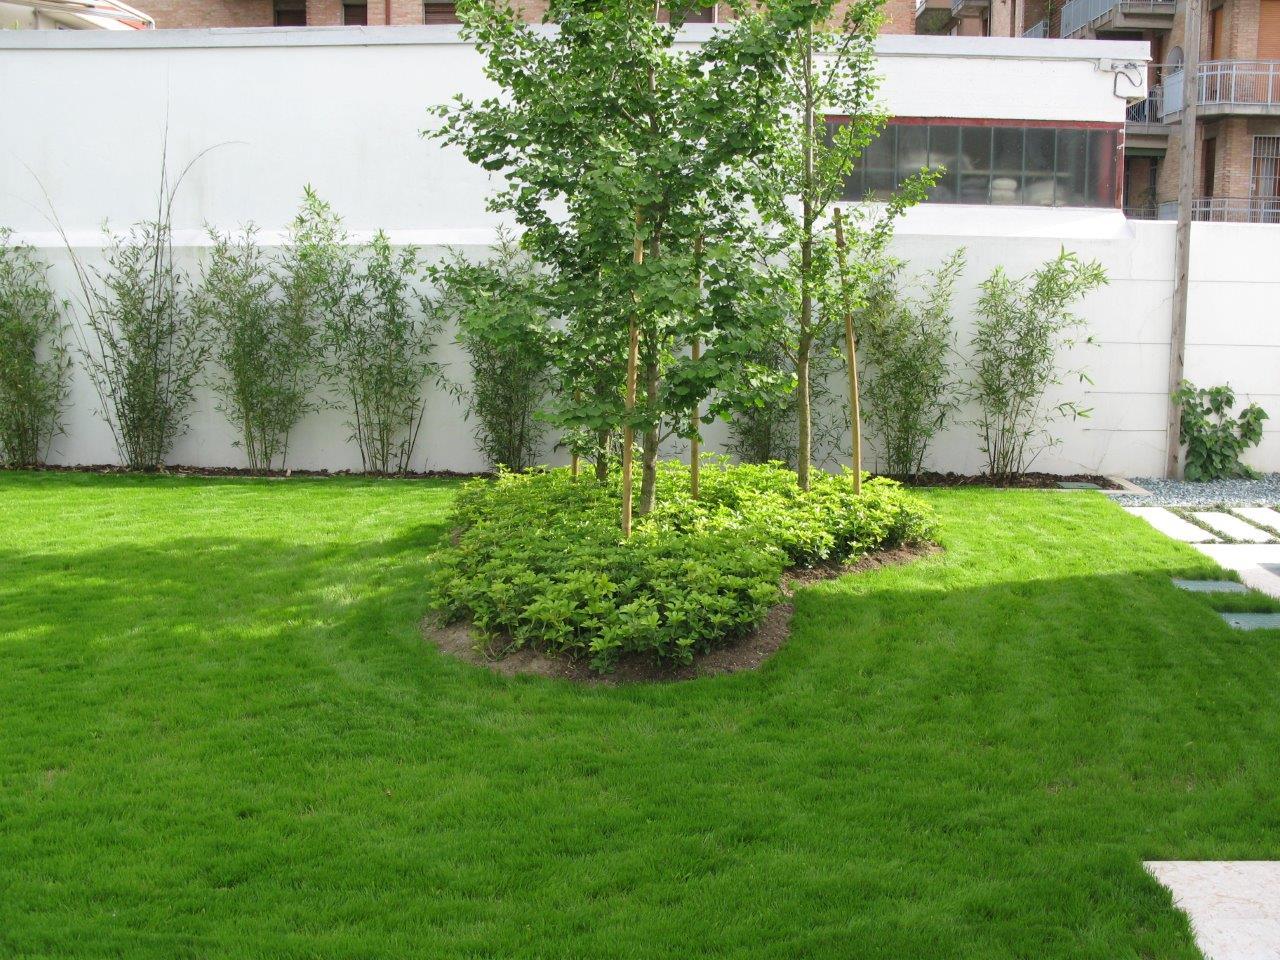 Giardini Moderni E Contemporanei : Giardini moderni e contemporanei idee e consigli per un giardini